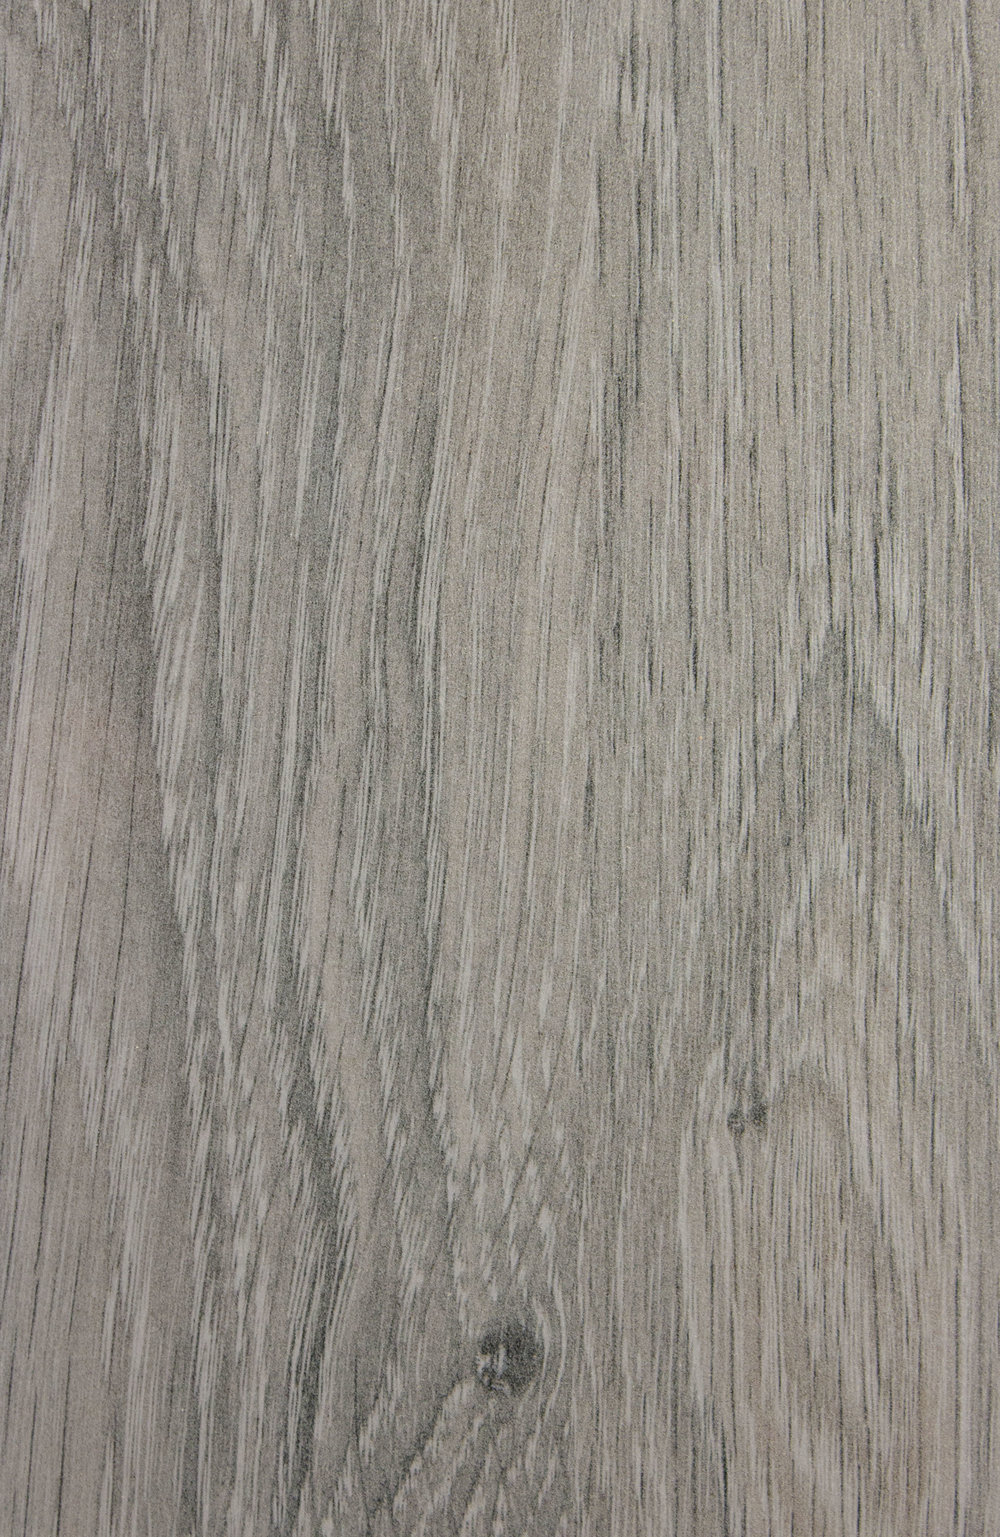 London Silver Oak High Gloss